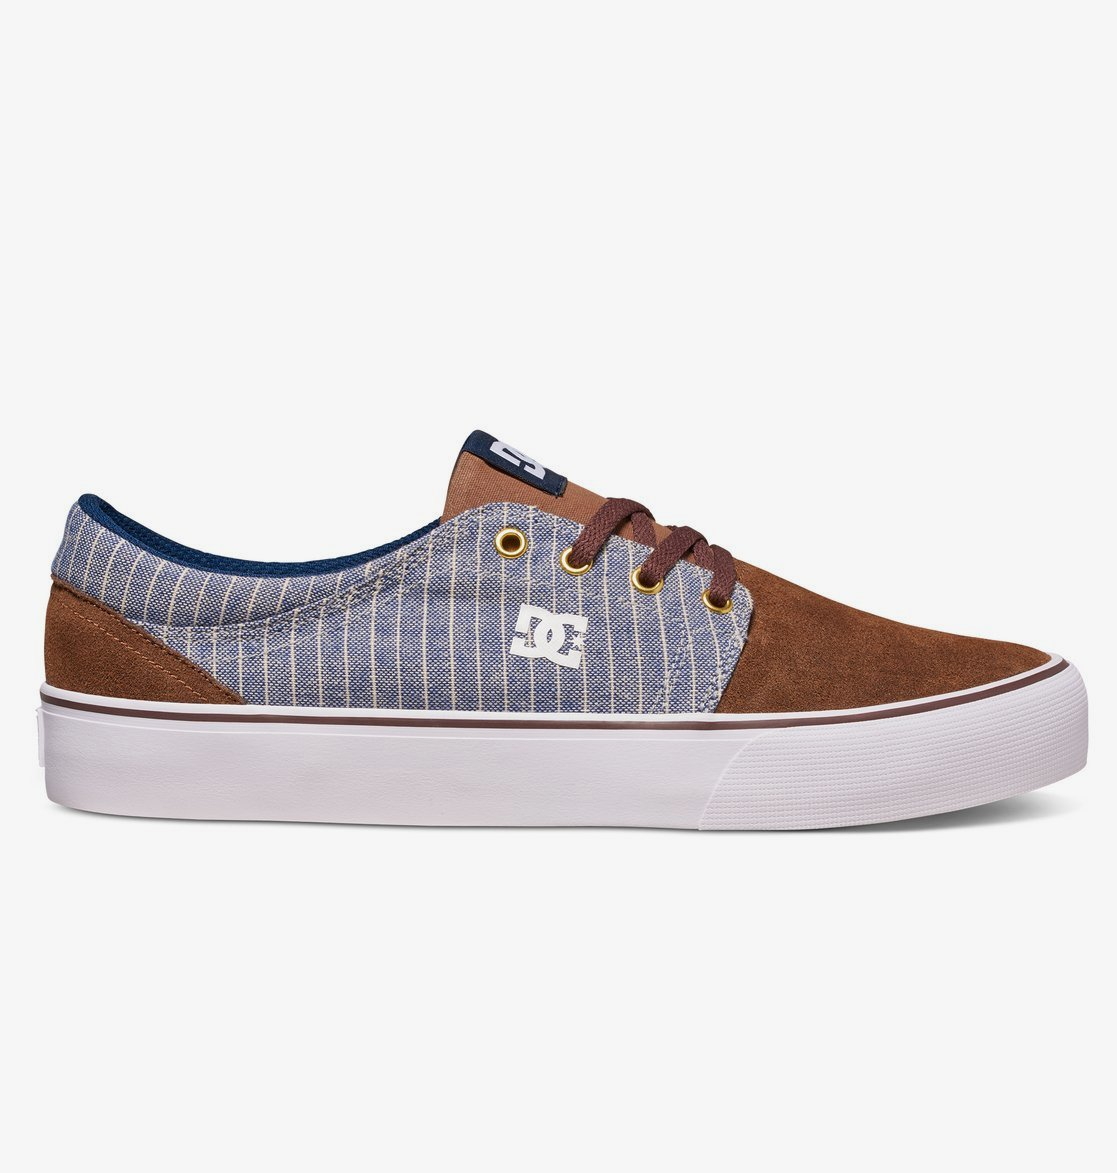 Trase SE - Scarpe da Uomo 3613372363313 | DC Shoes